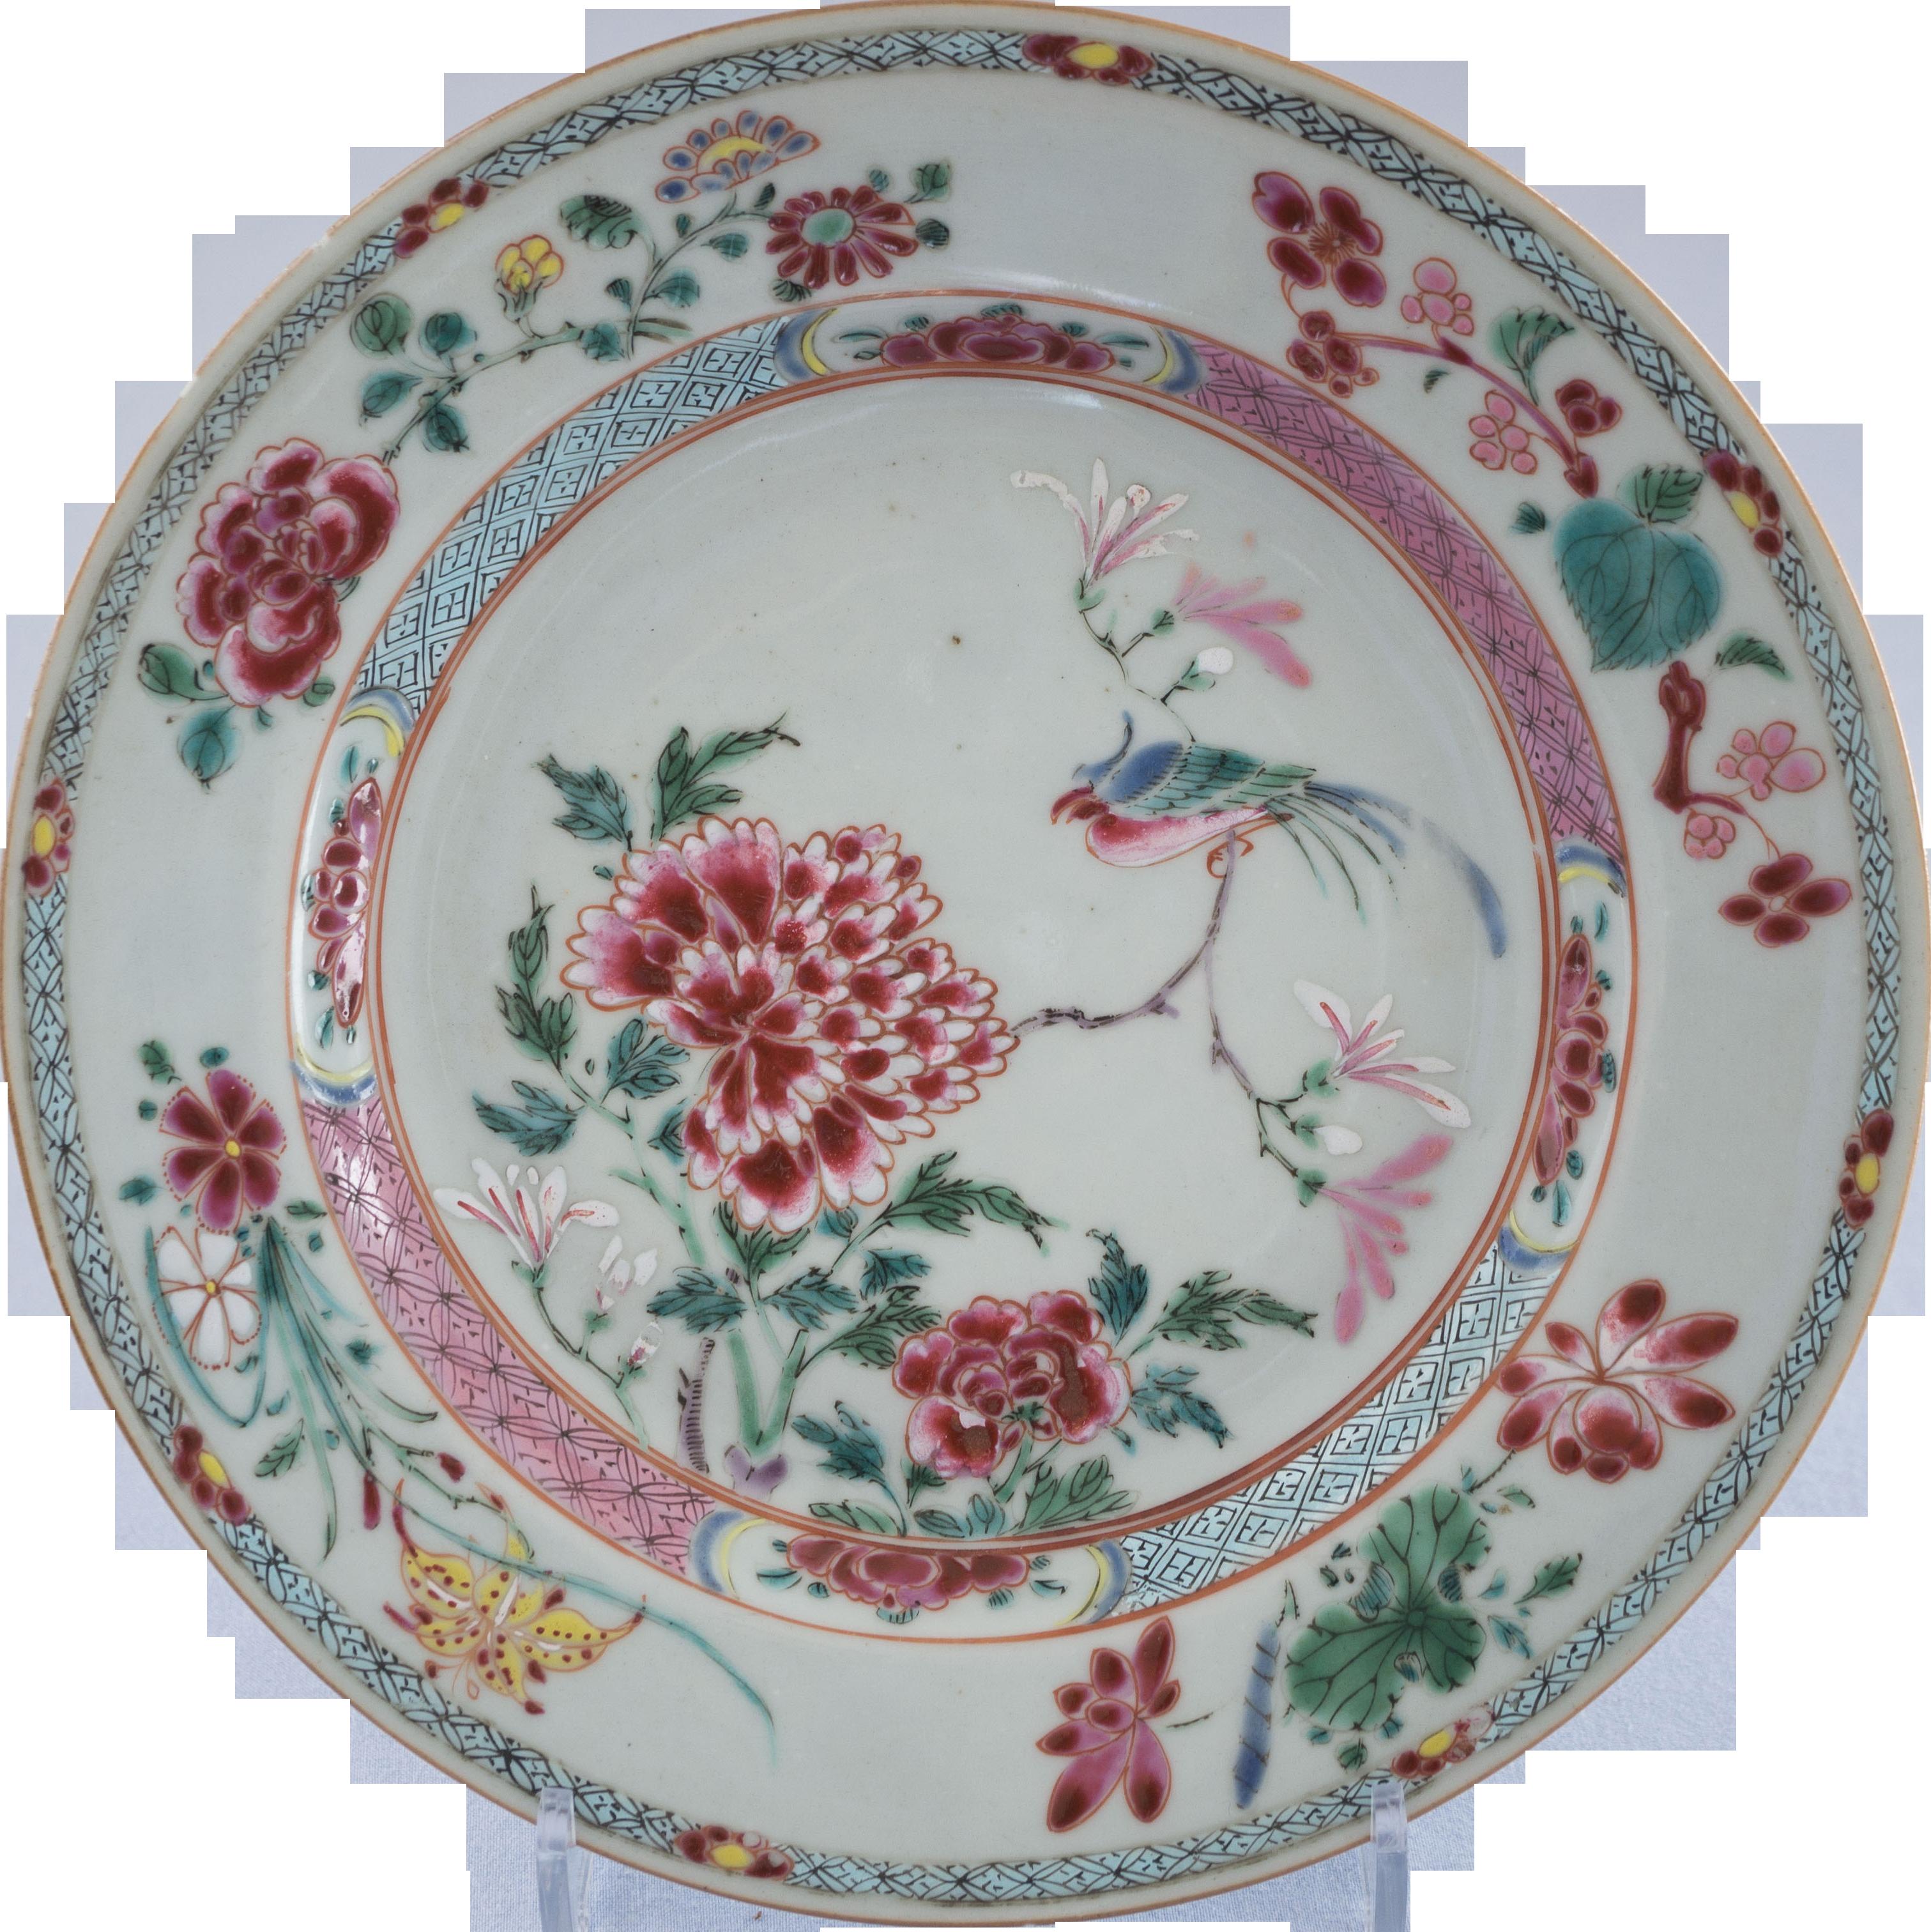 Chinese antique Qing dynasty Qianlong style colour enamel famille rose fencai porcelain plate.Chinese antique dish,Ornament,ceramic vintage